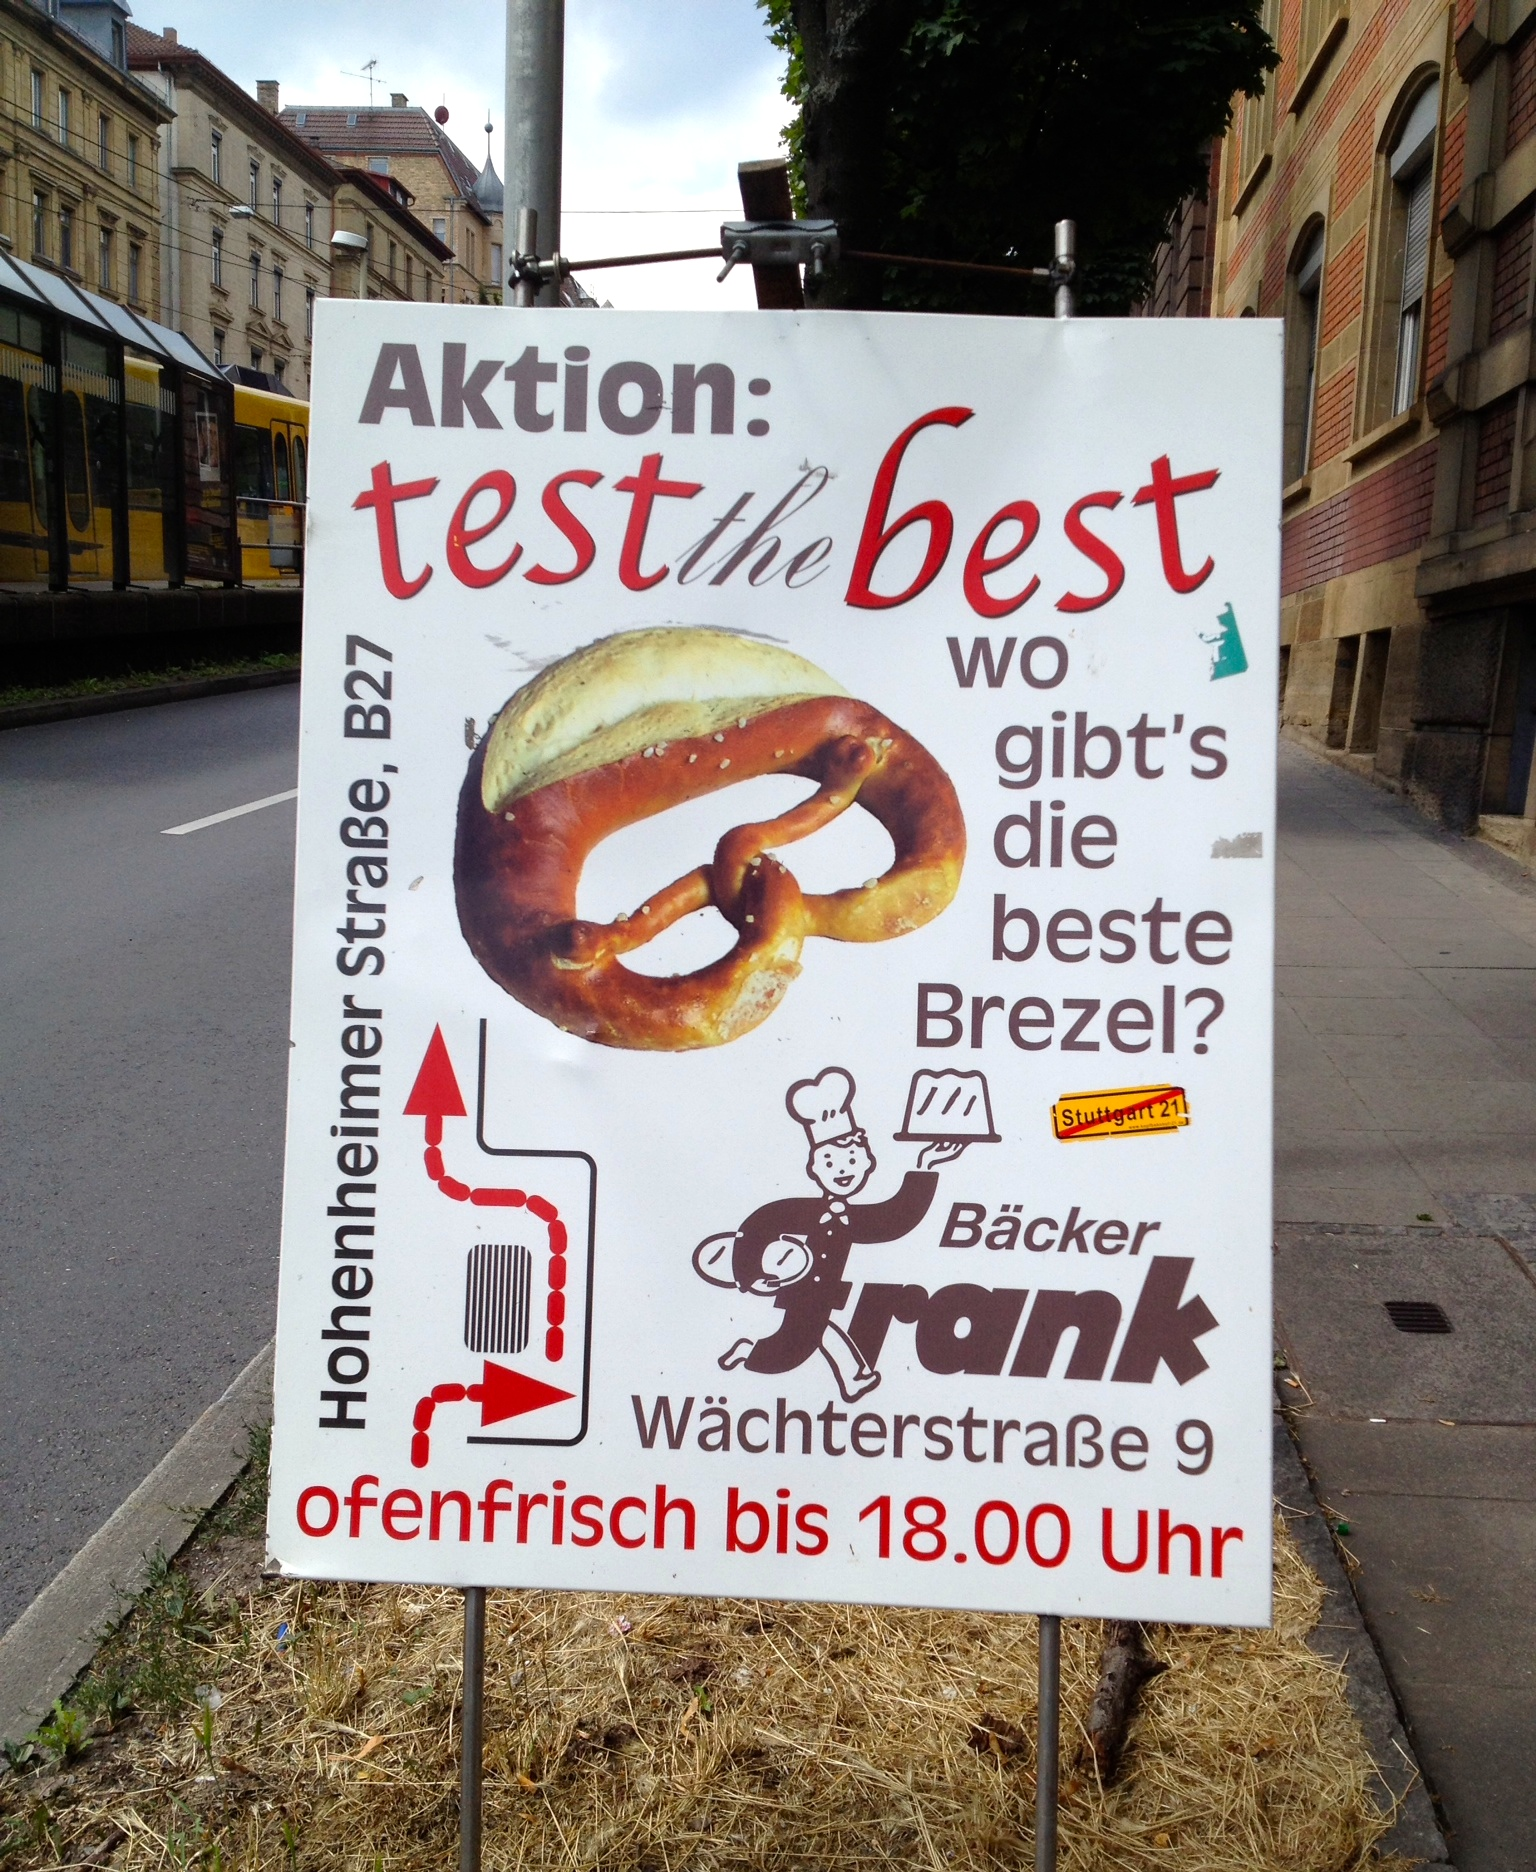 The sign advertising Bäckerei Frank's pretzels